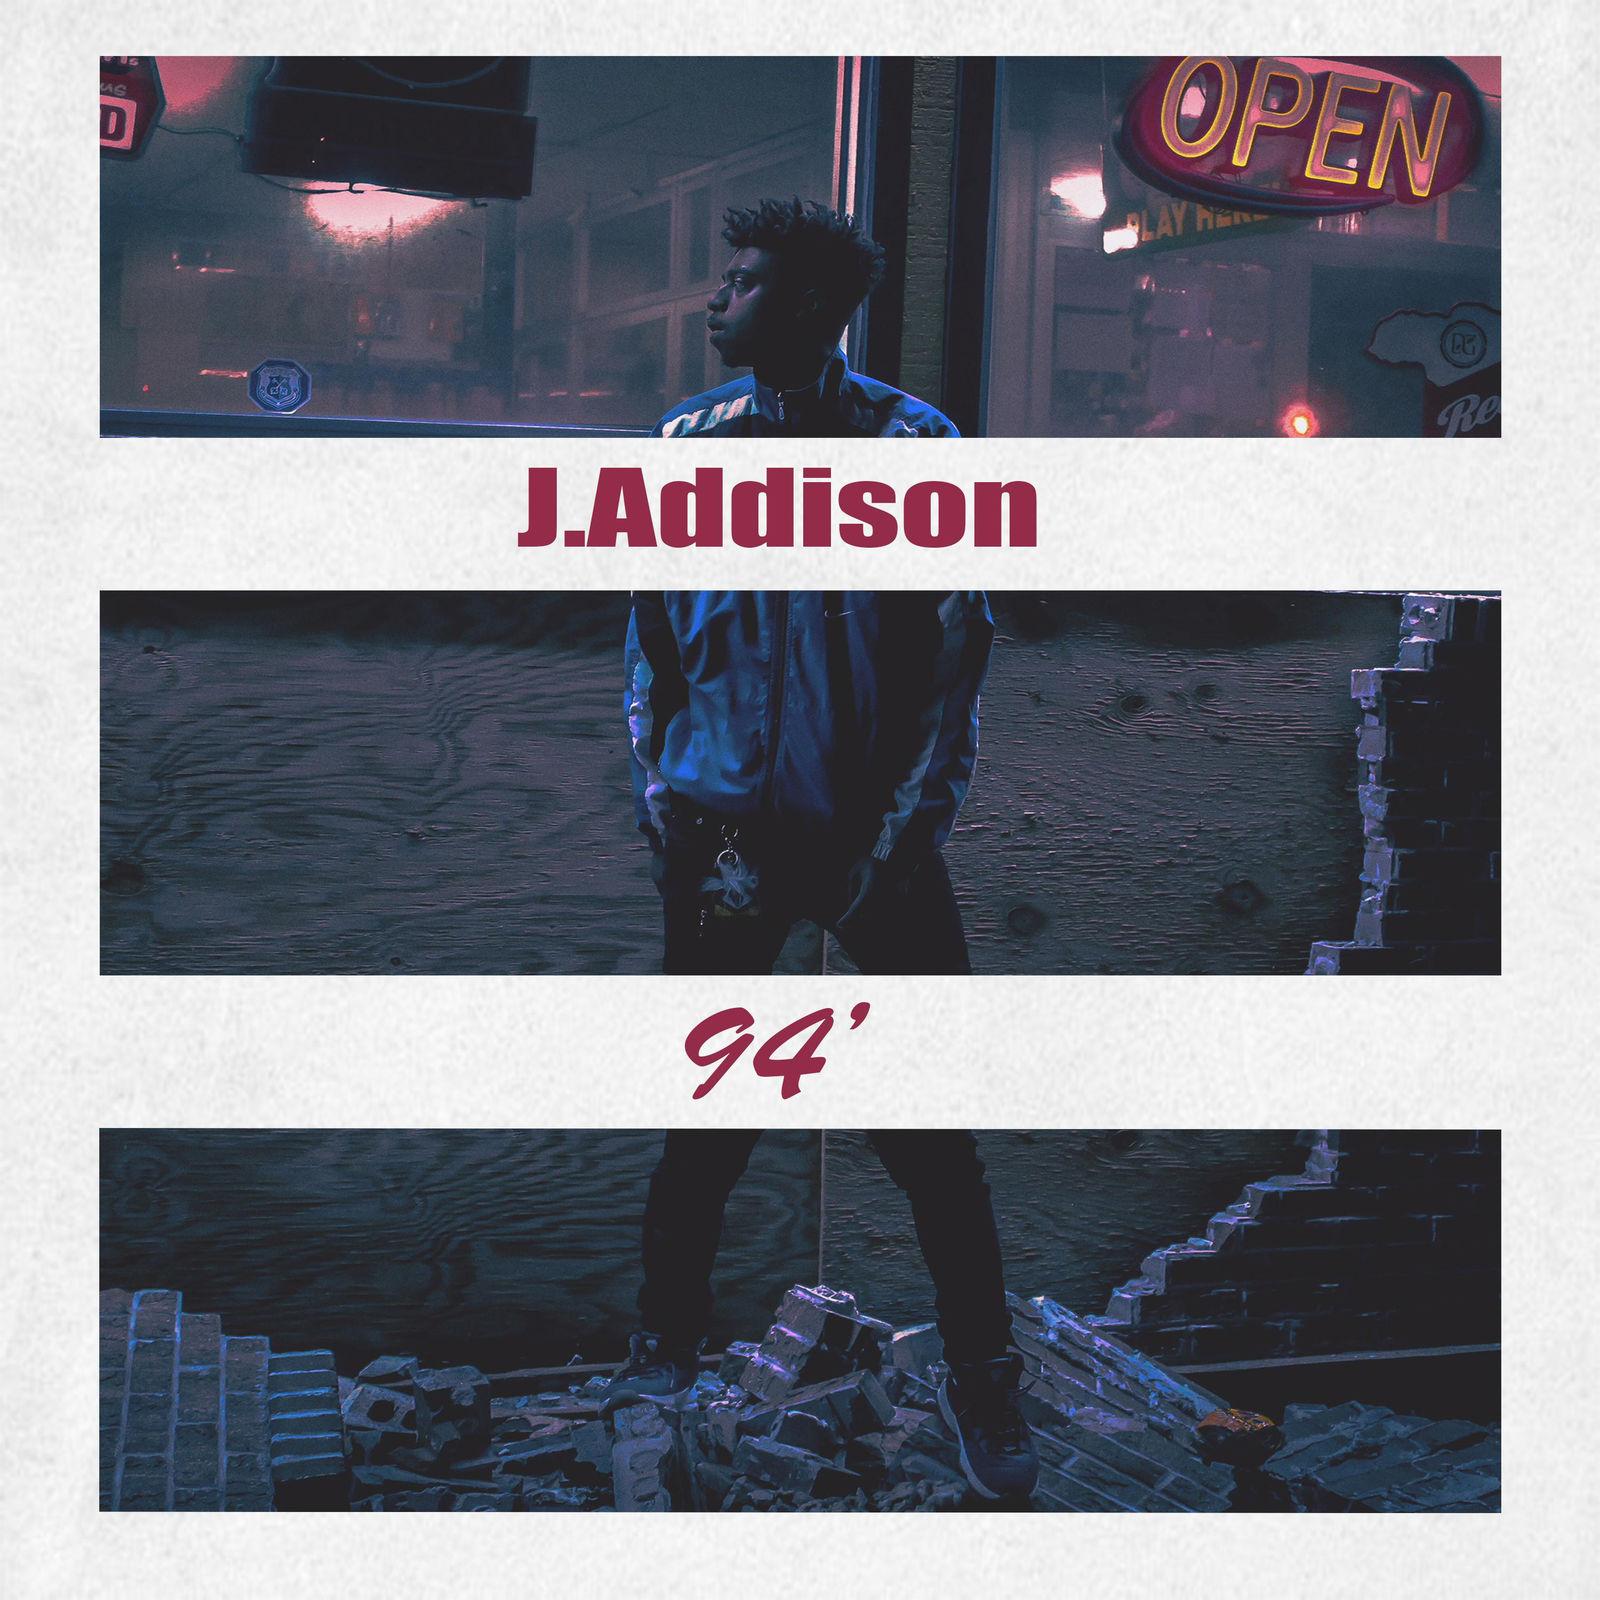 J. Addison